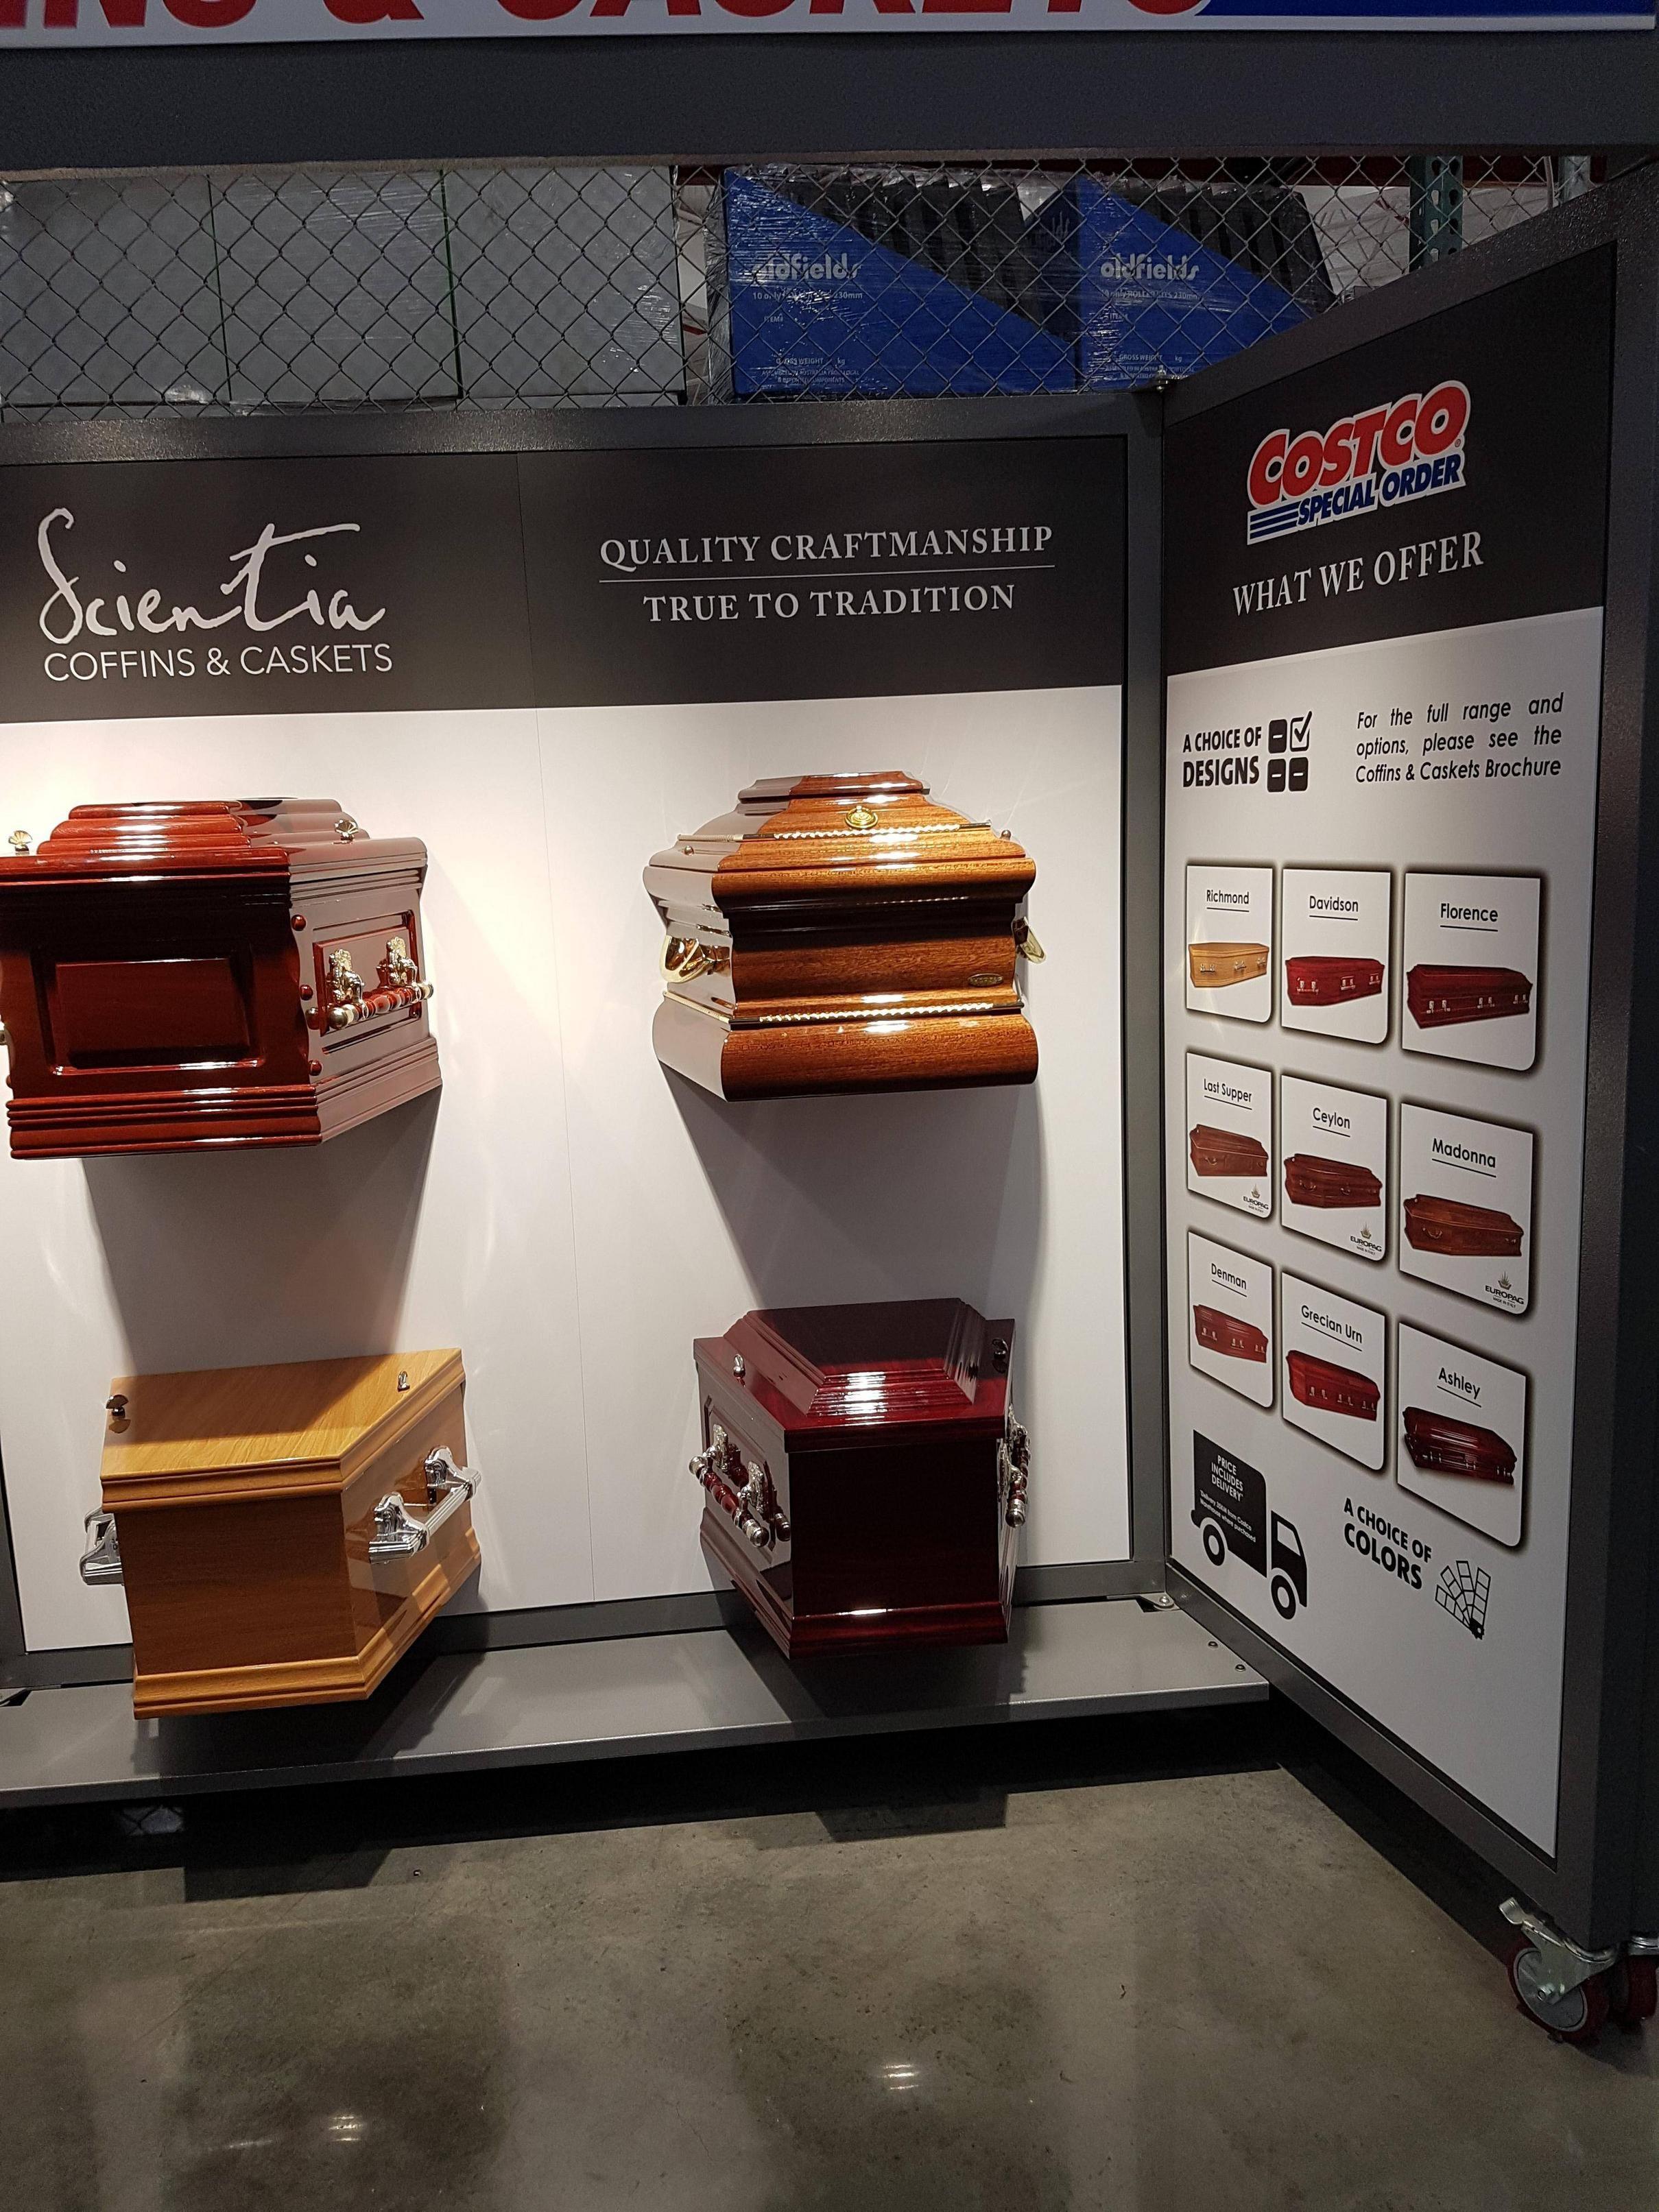 Costco sells coffins now